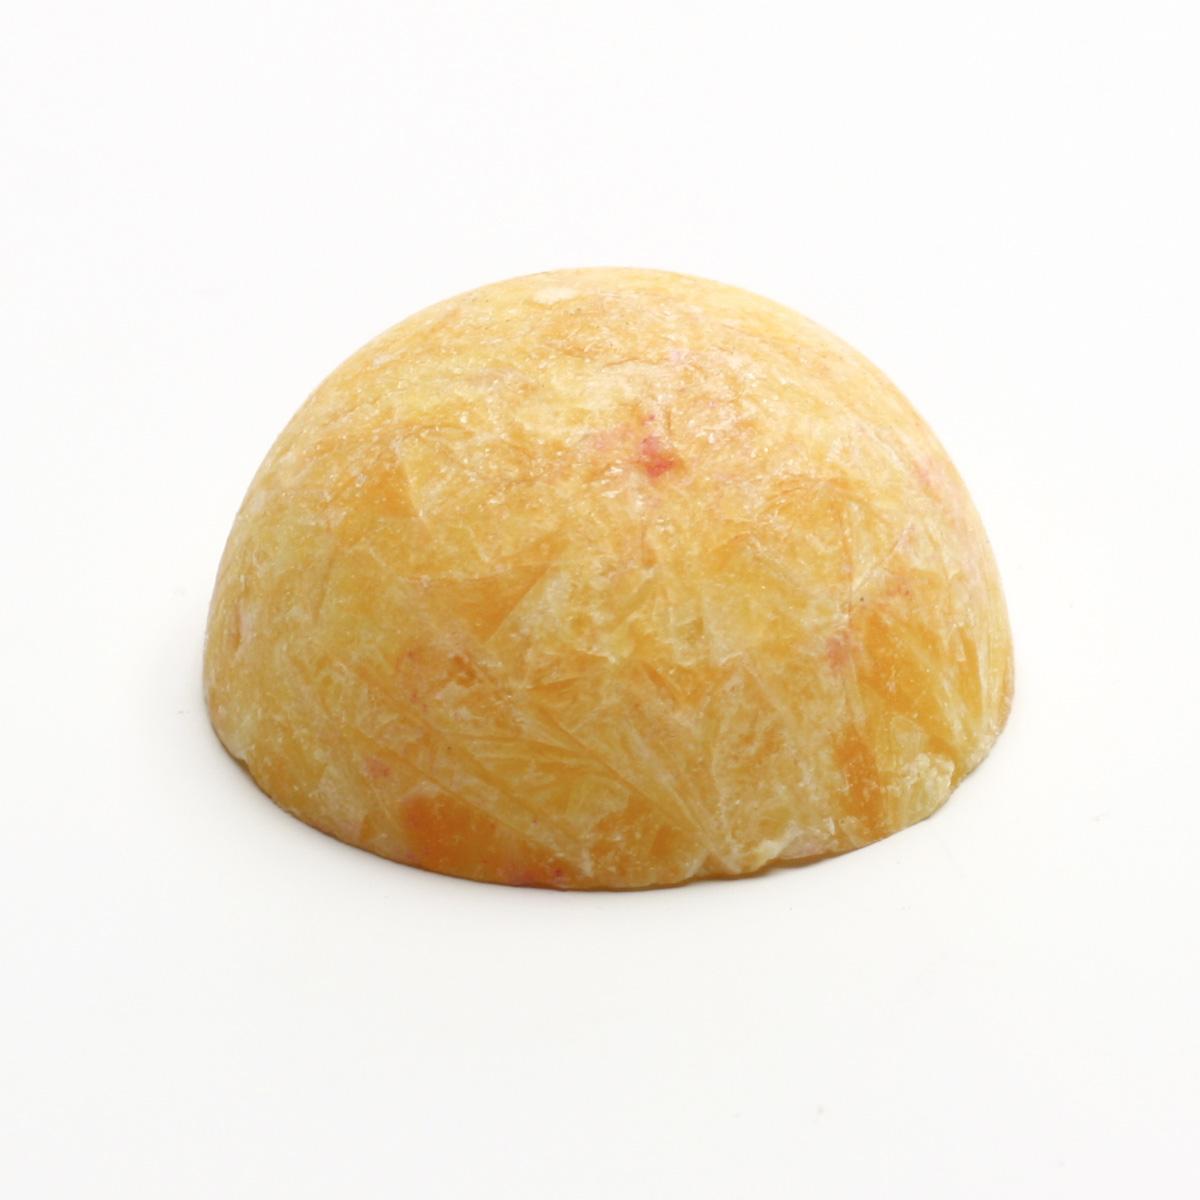 Kerzenfarm Kapsle do aromalampy, Orange Vanilla 1 ks